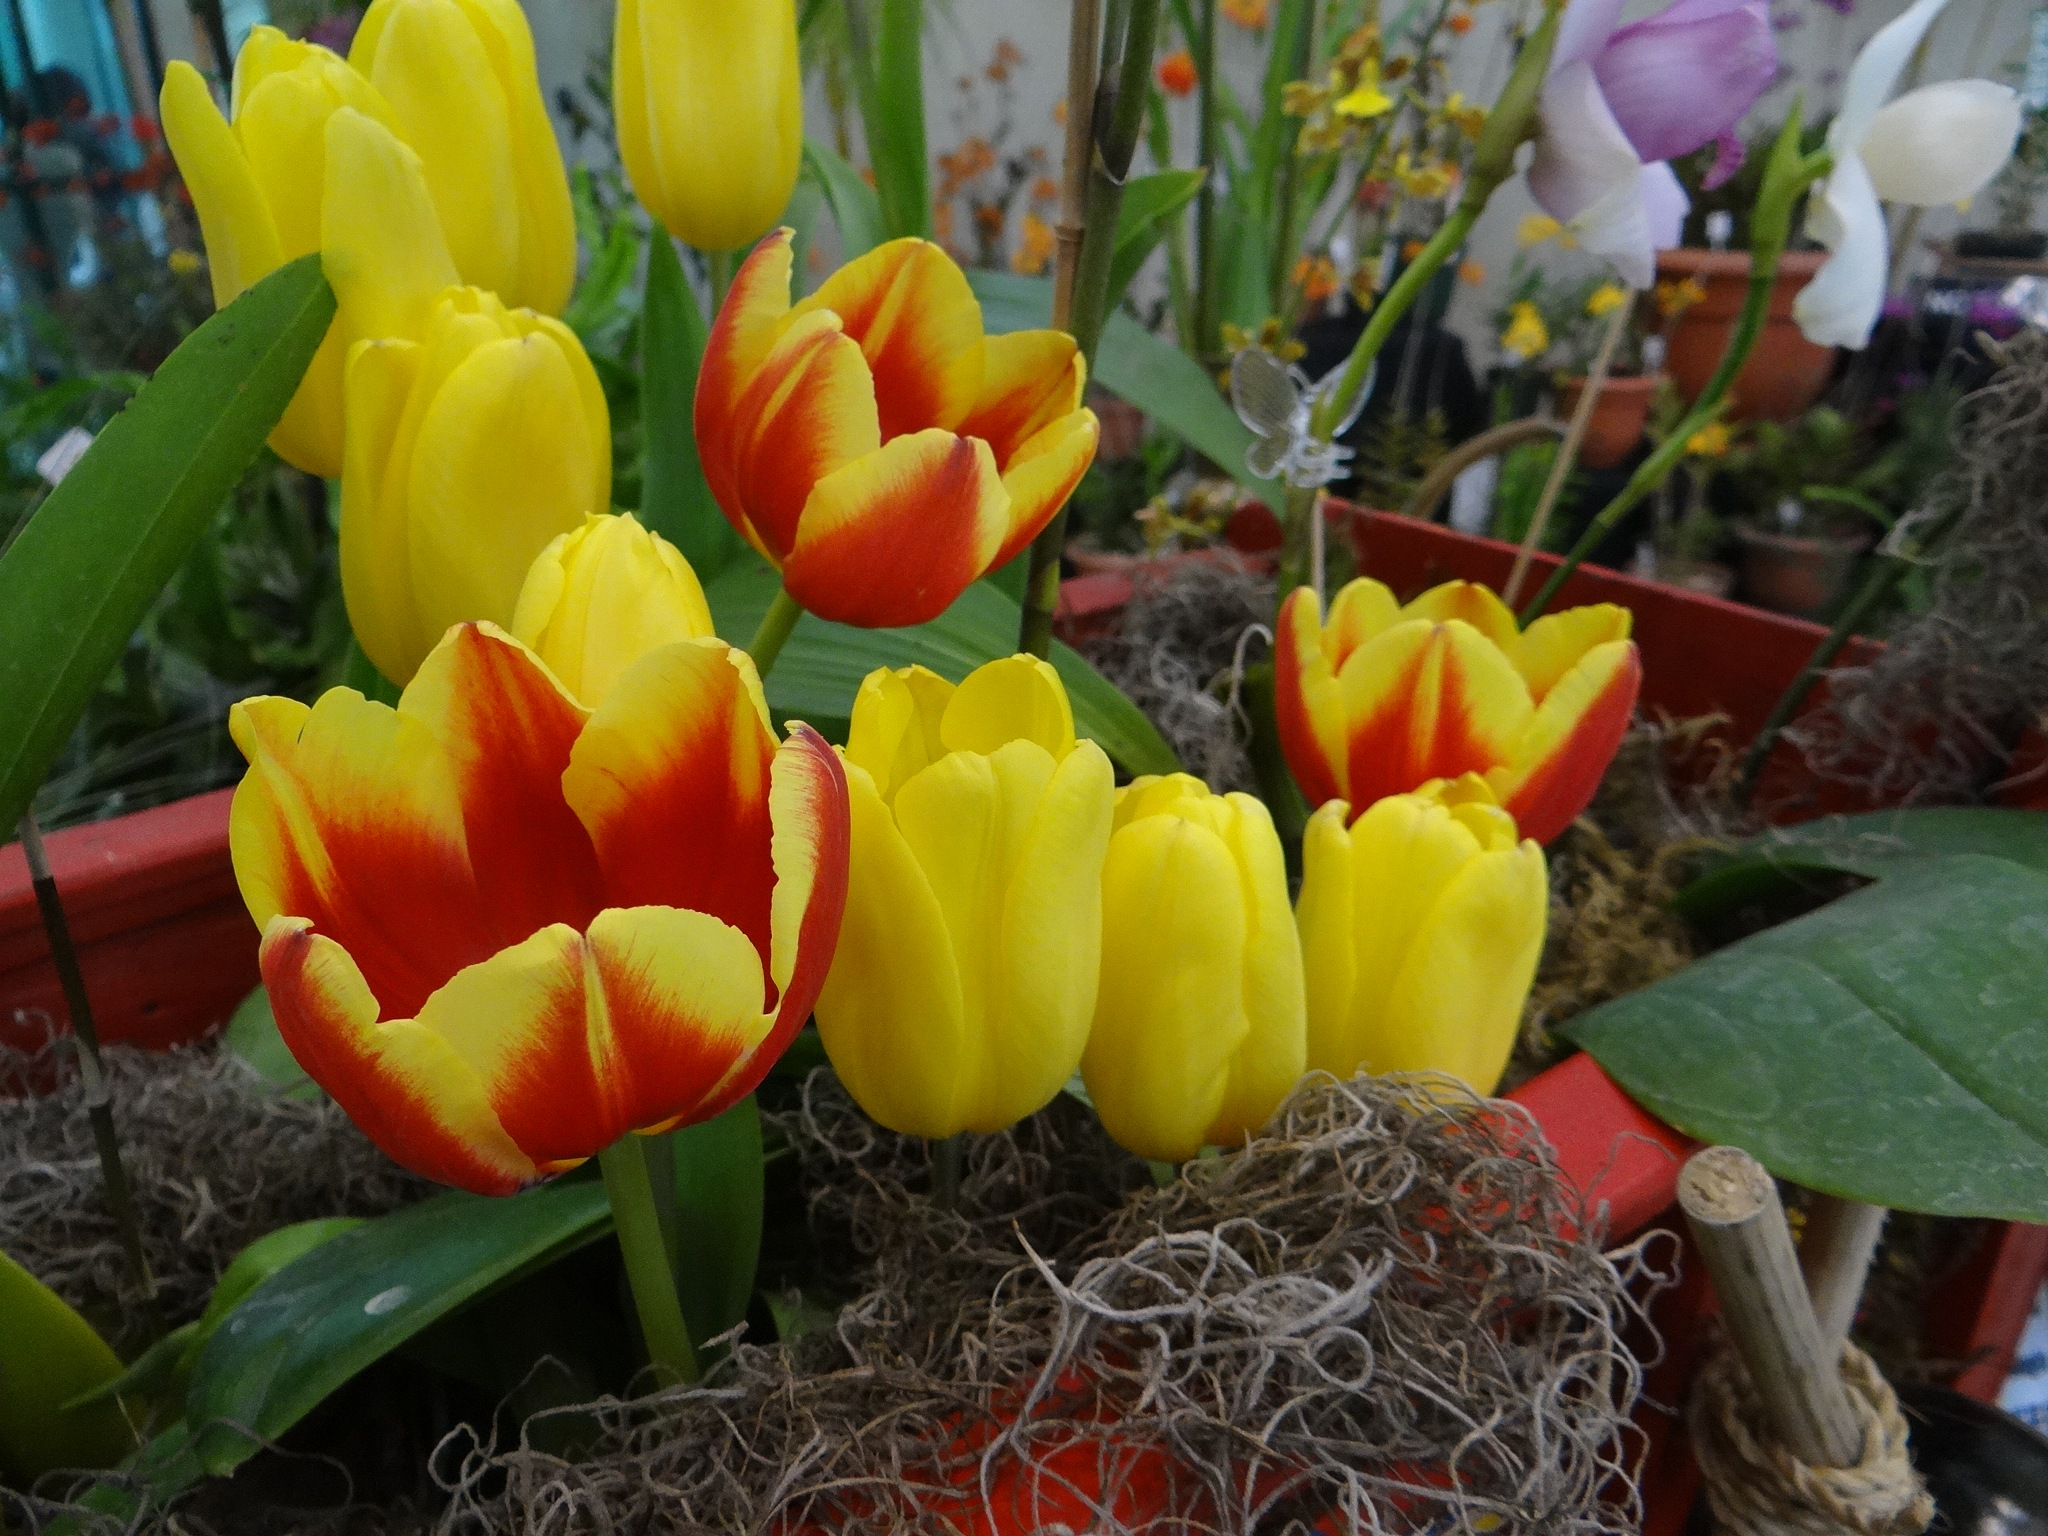 Tulipanes by vladybachez